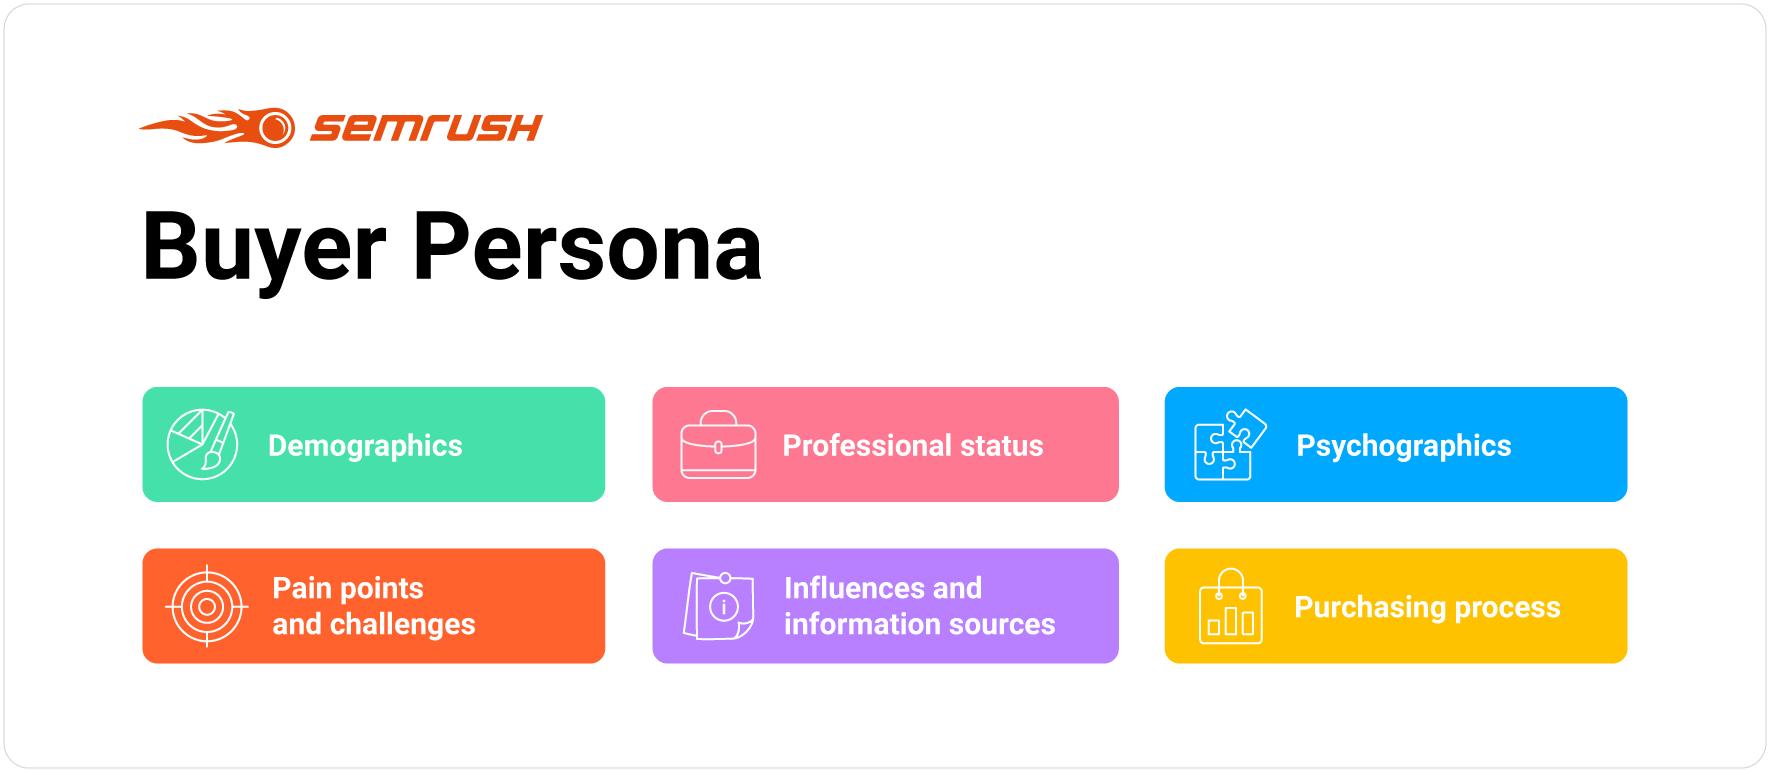 How to create your buyer persona - Semrush